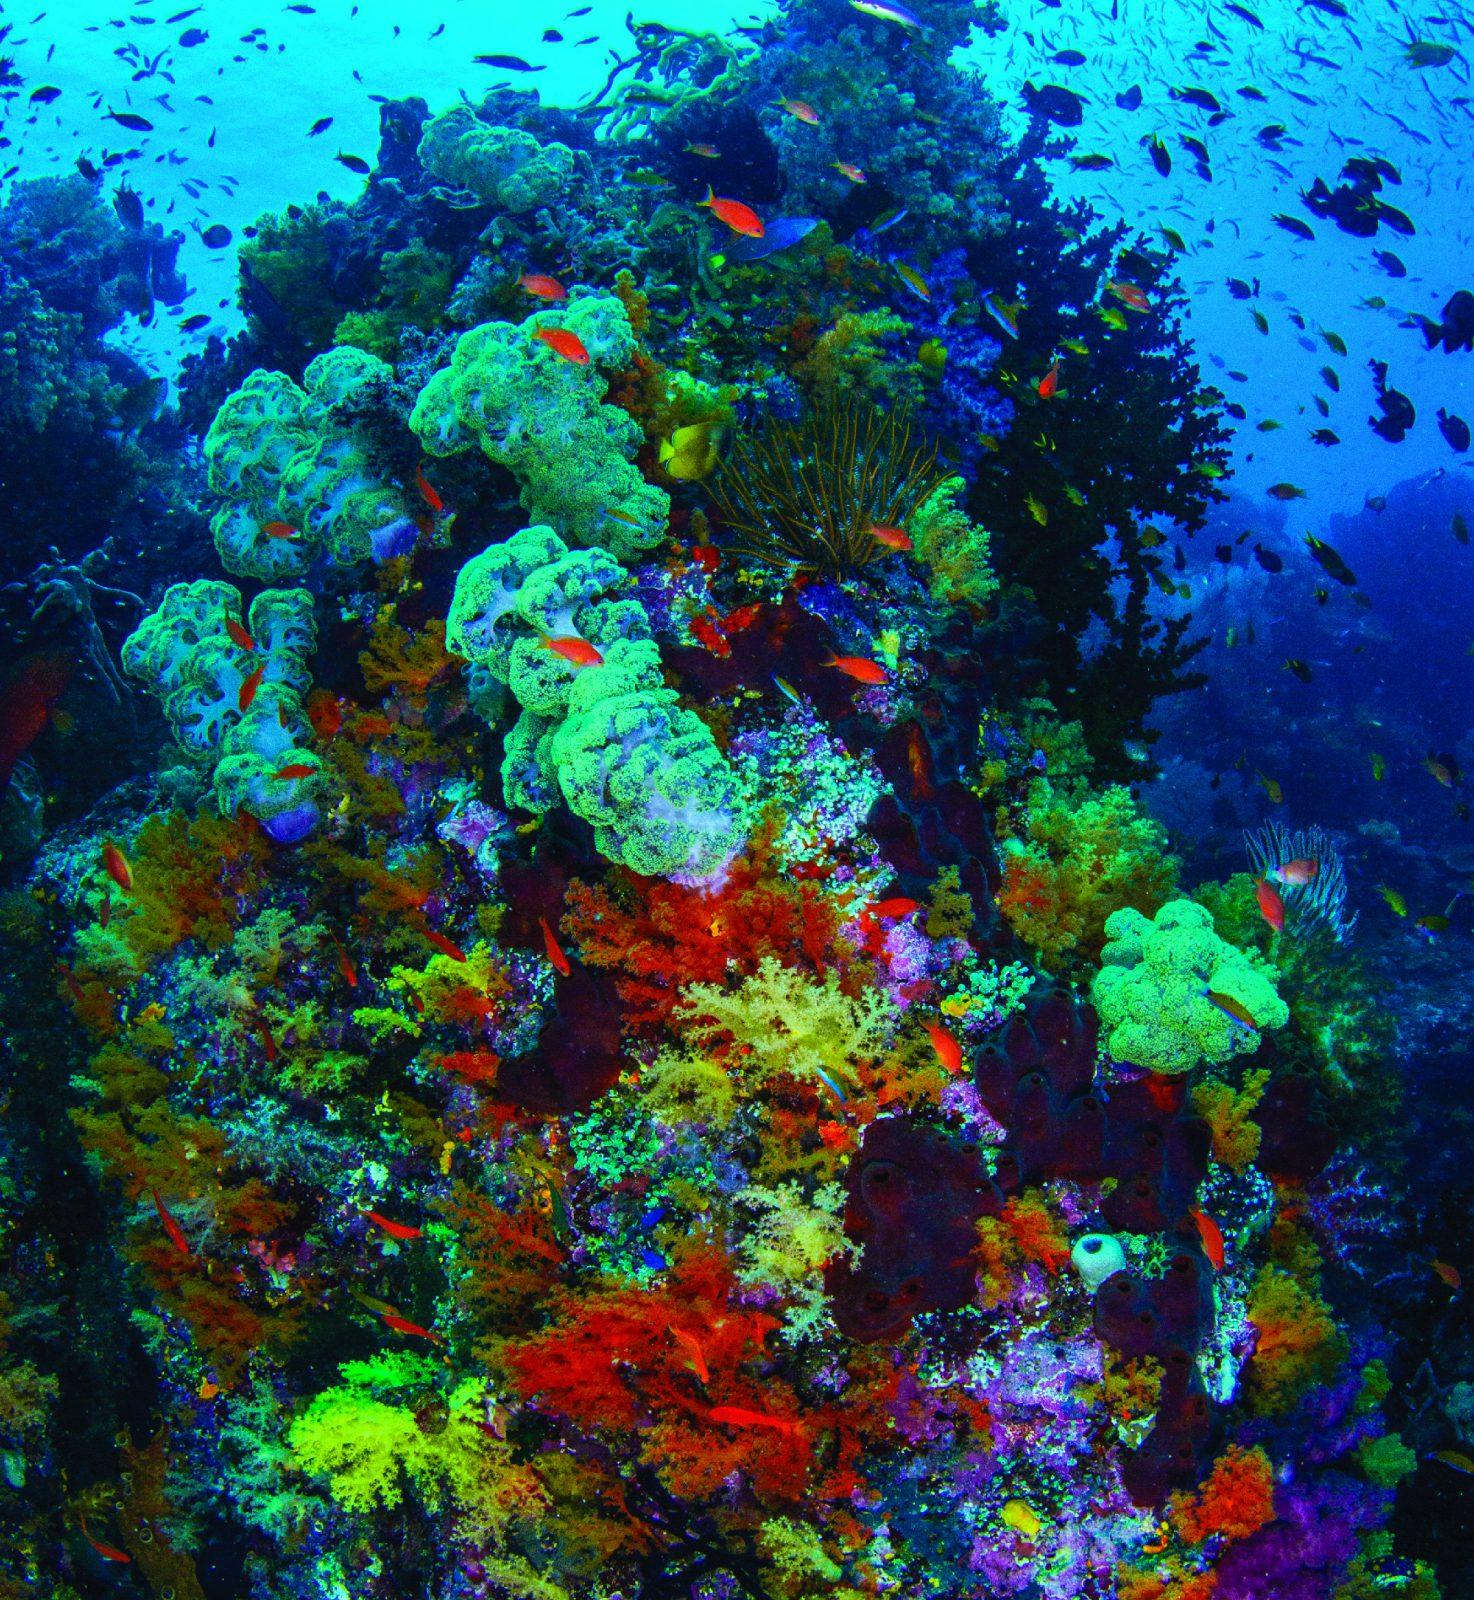 richest marine biodiversity on earth